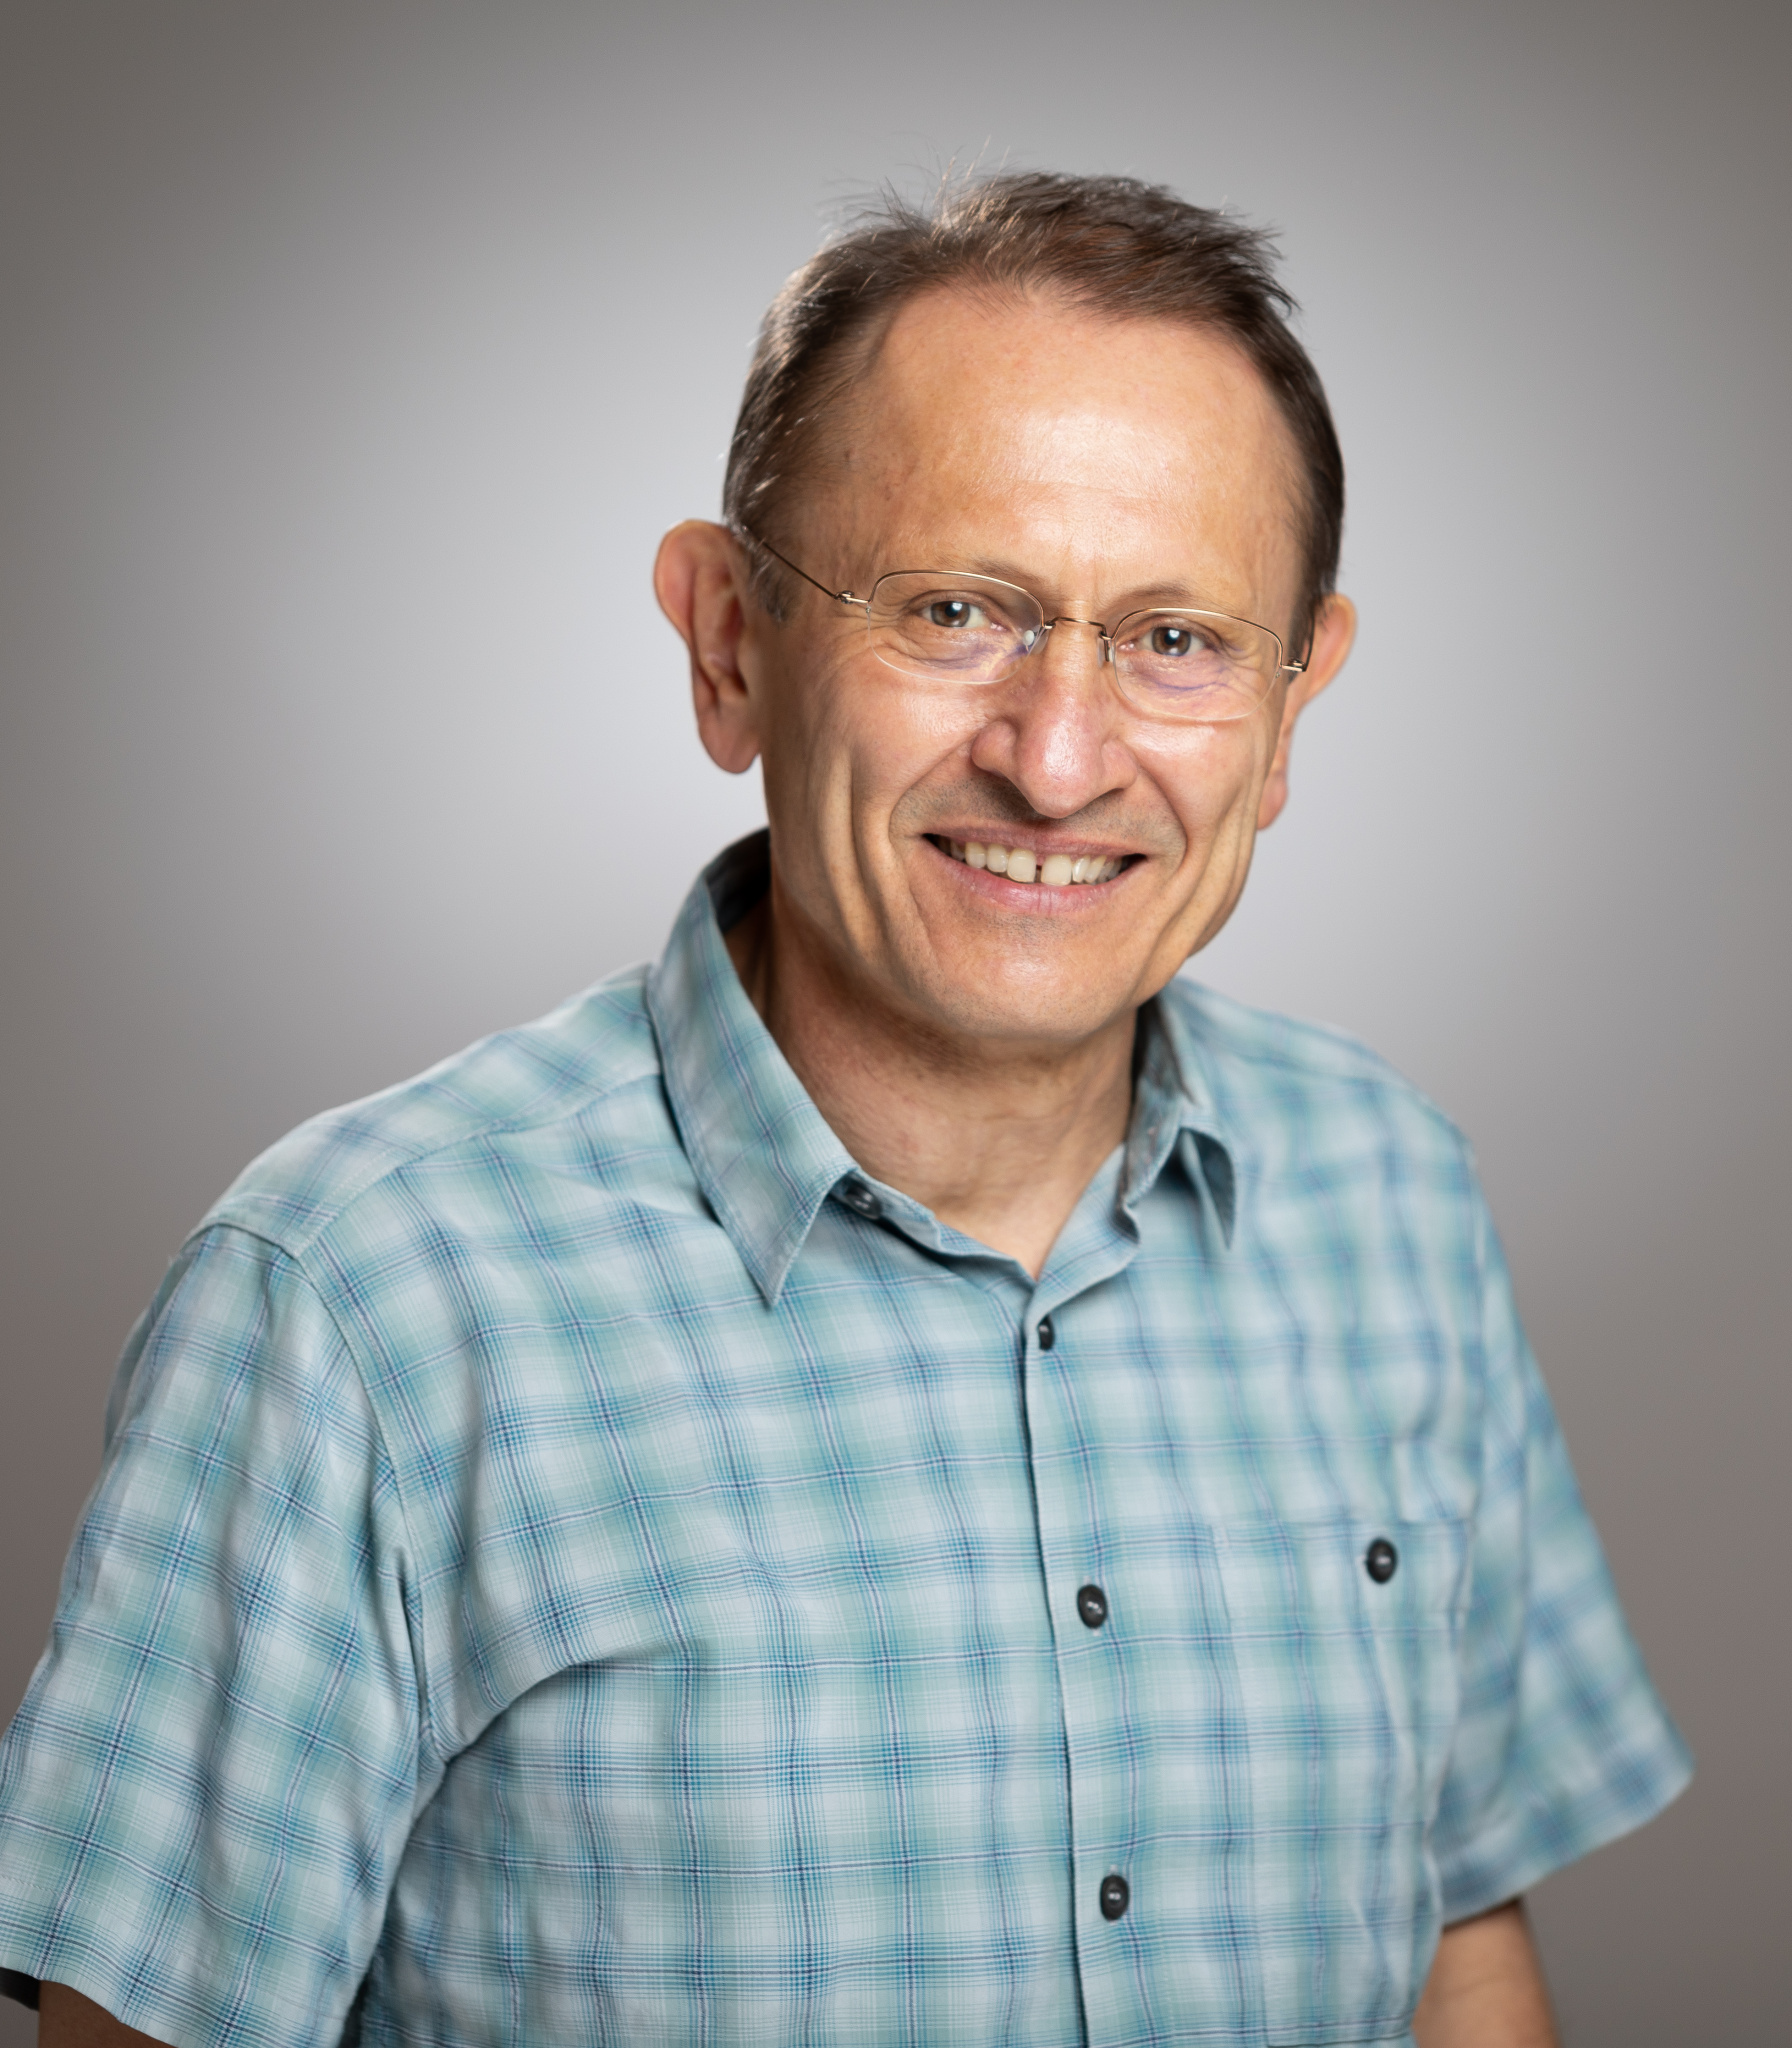 Roland Thurner, 63